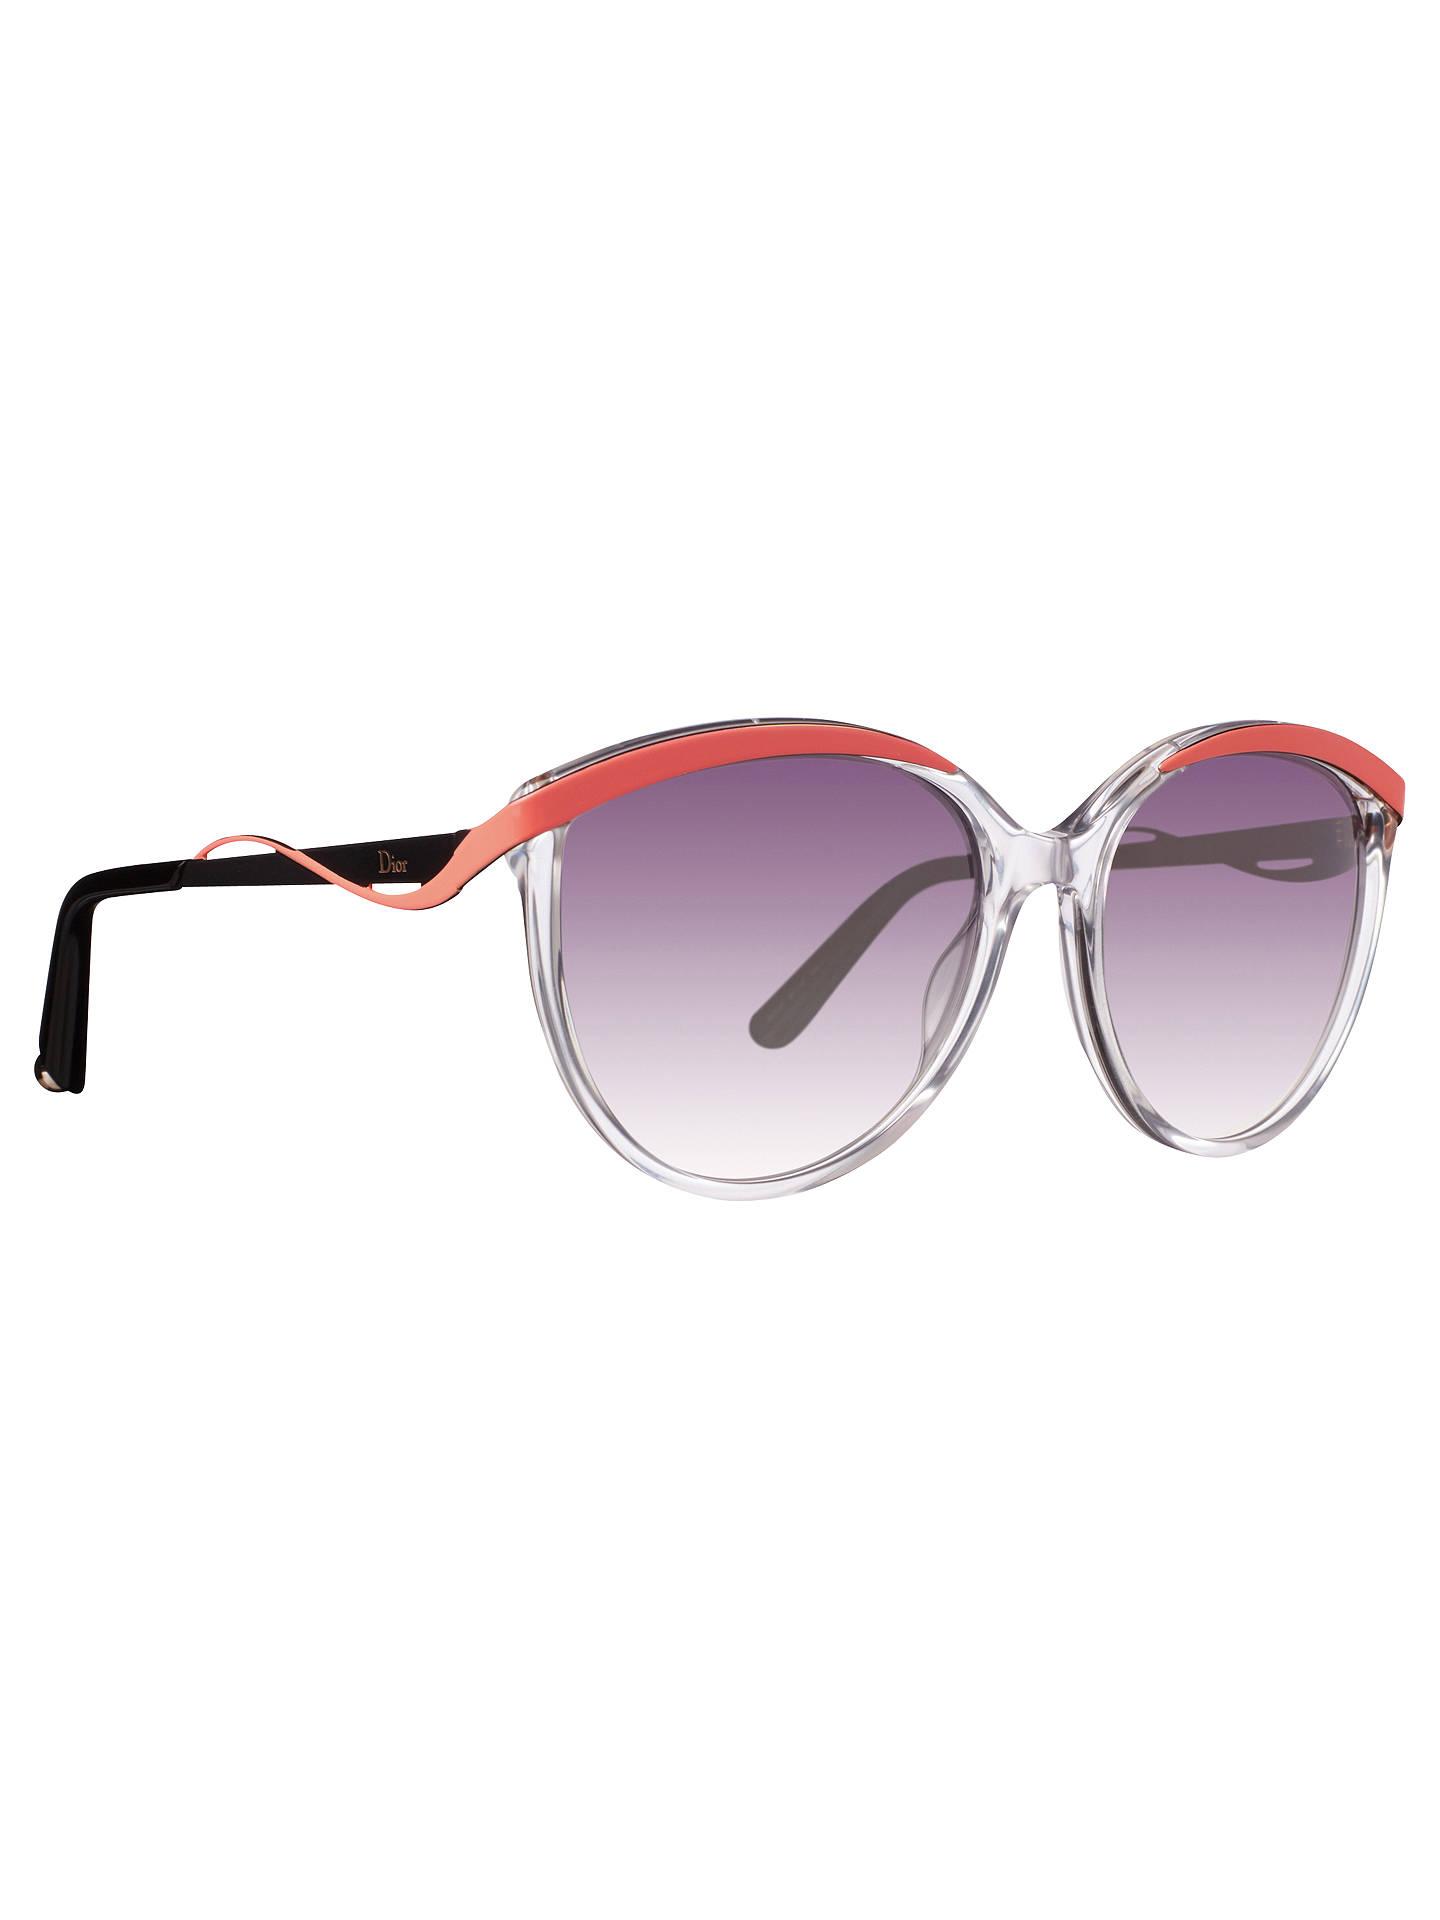 ebfecc2eb41a8 ... Buy Christian Dior Metal Eyes 1 6OCIZ Cat s Eye Plastic And Metal Frame  Sunglasses